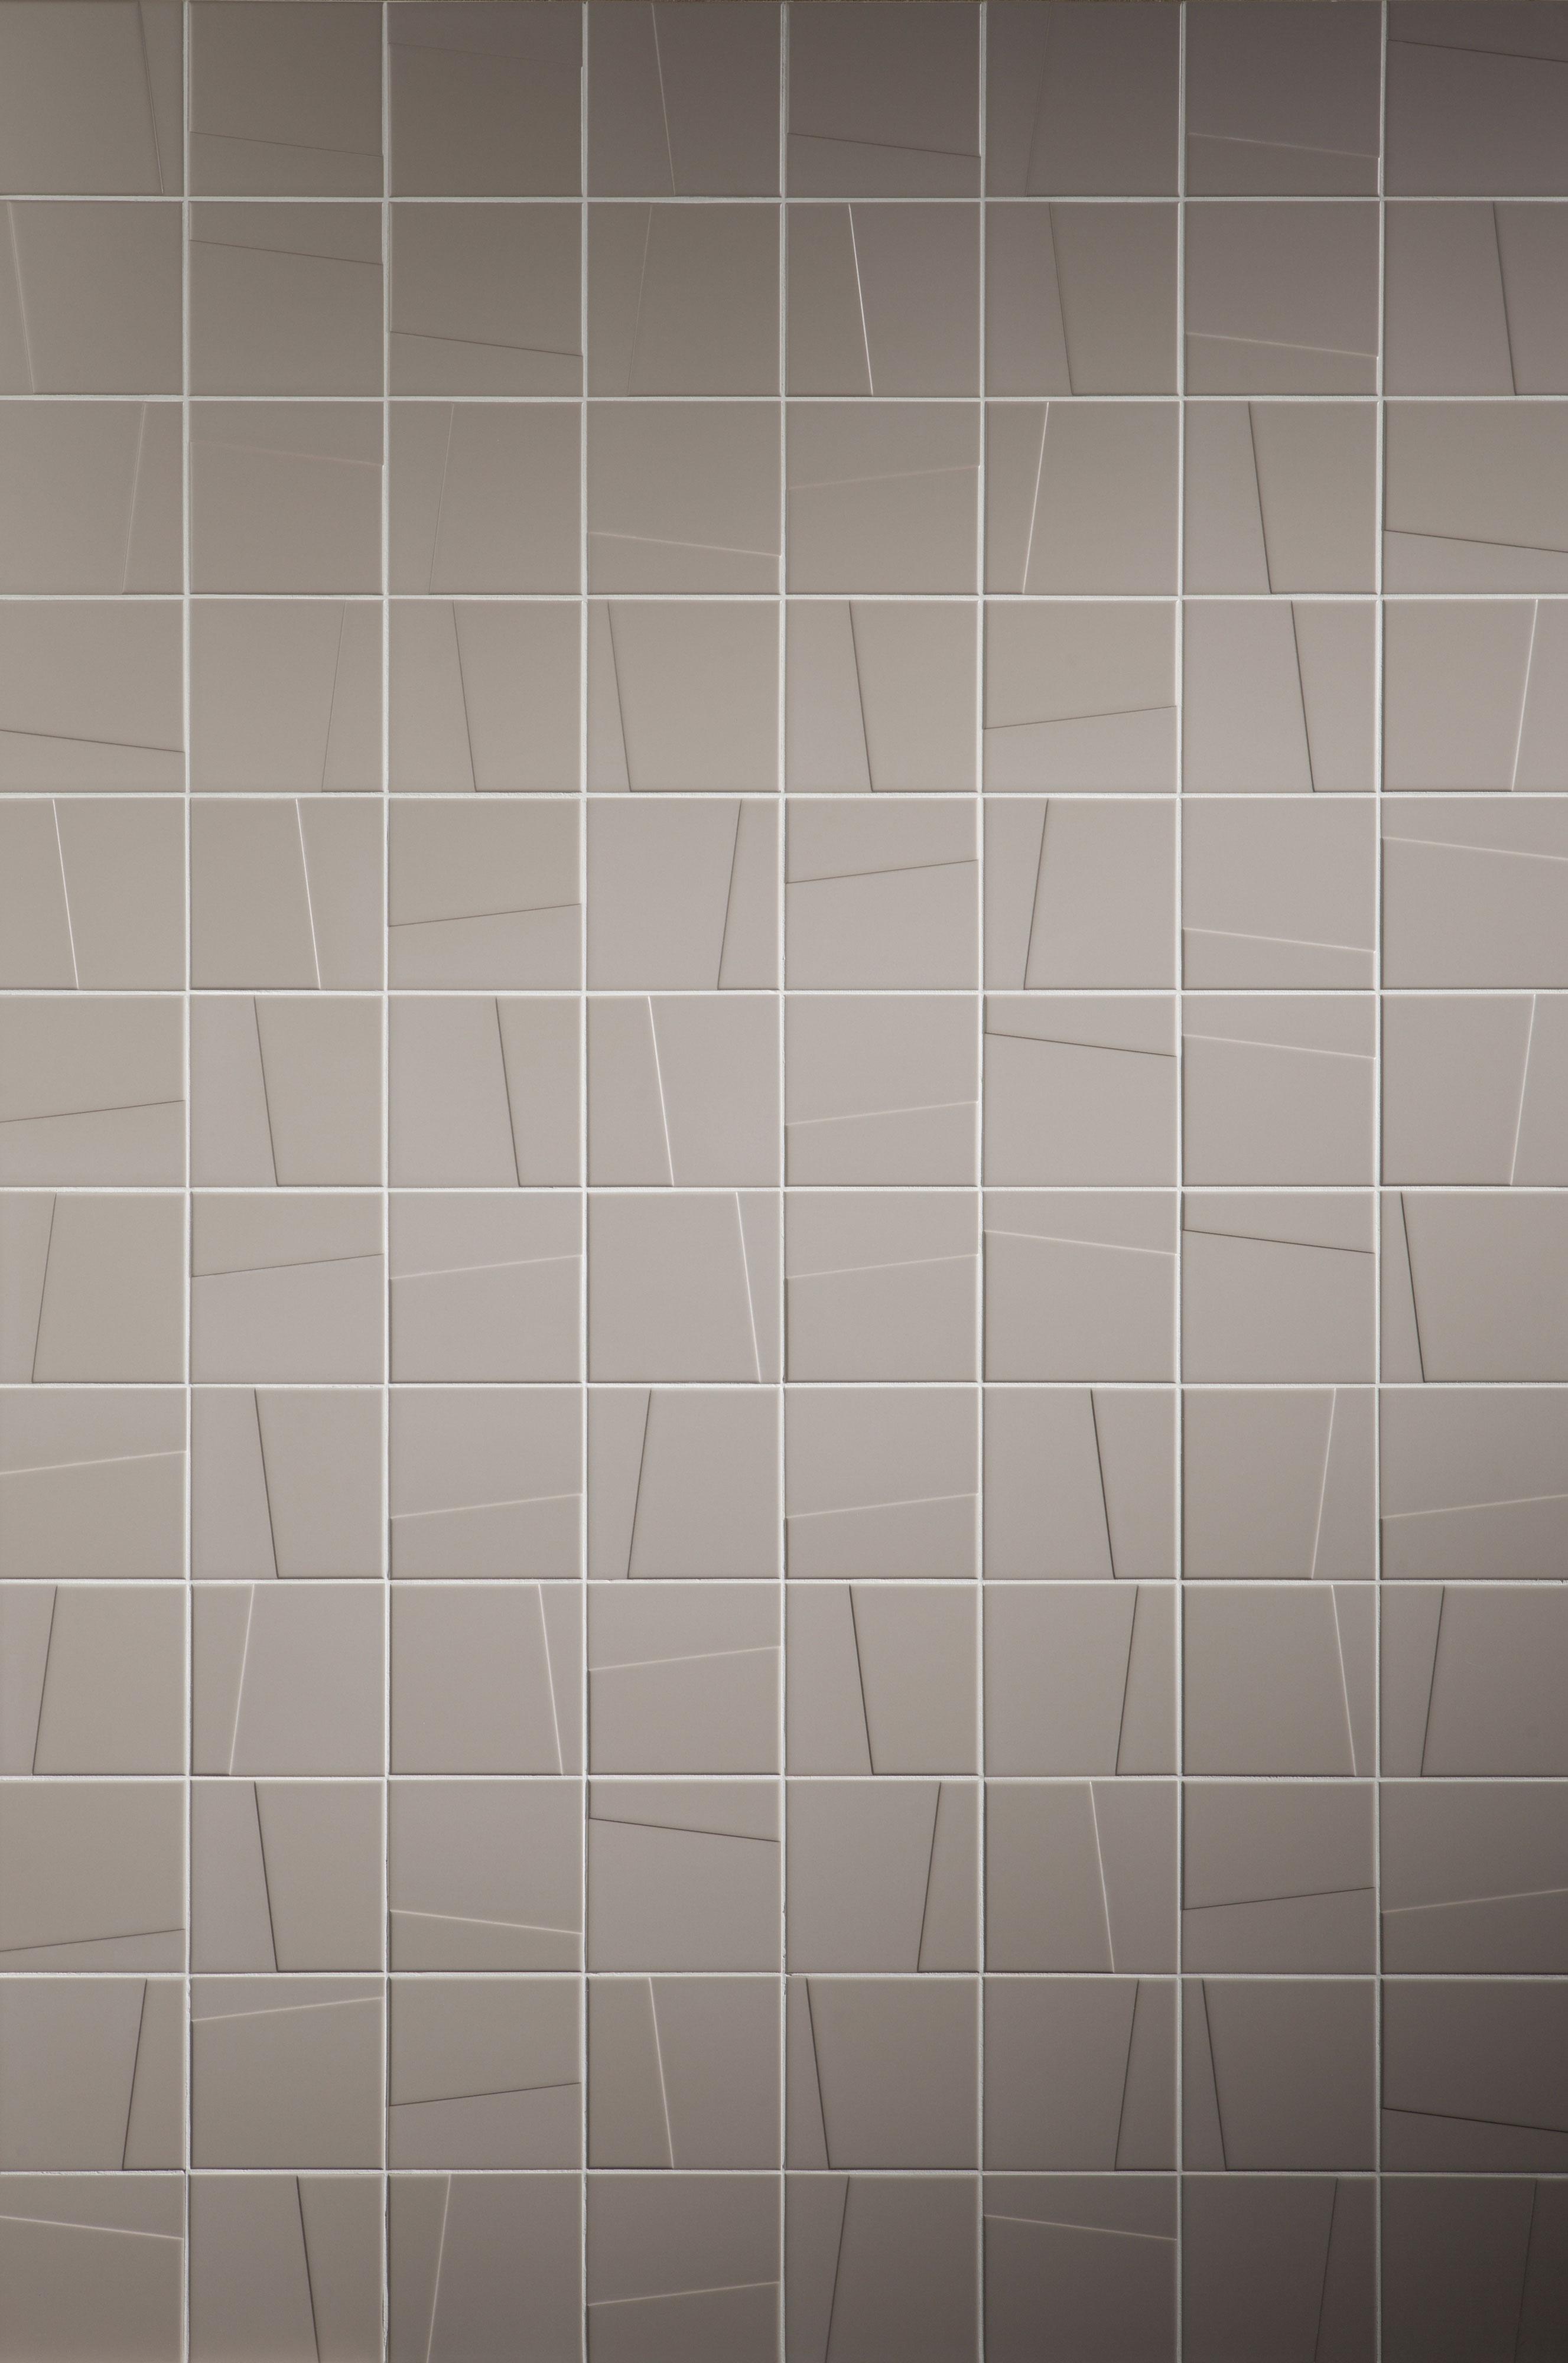 ditail-ceramica-soluciones-mosa-murals-lines-v-02